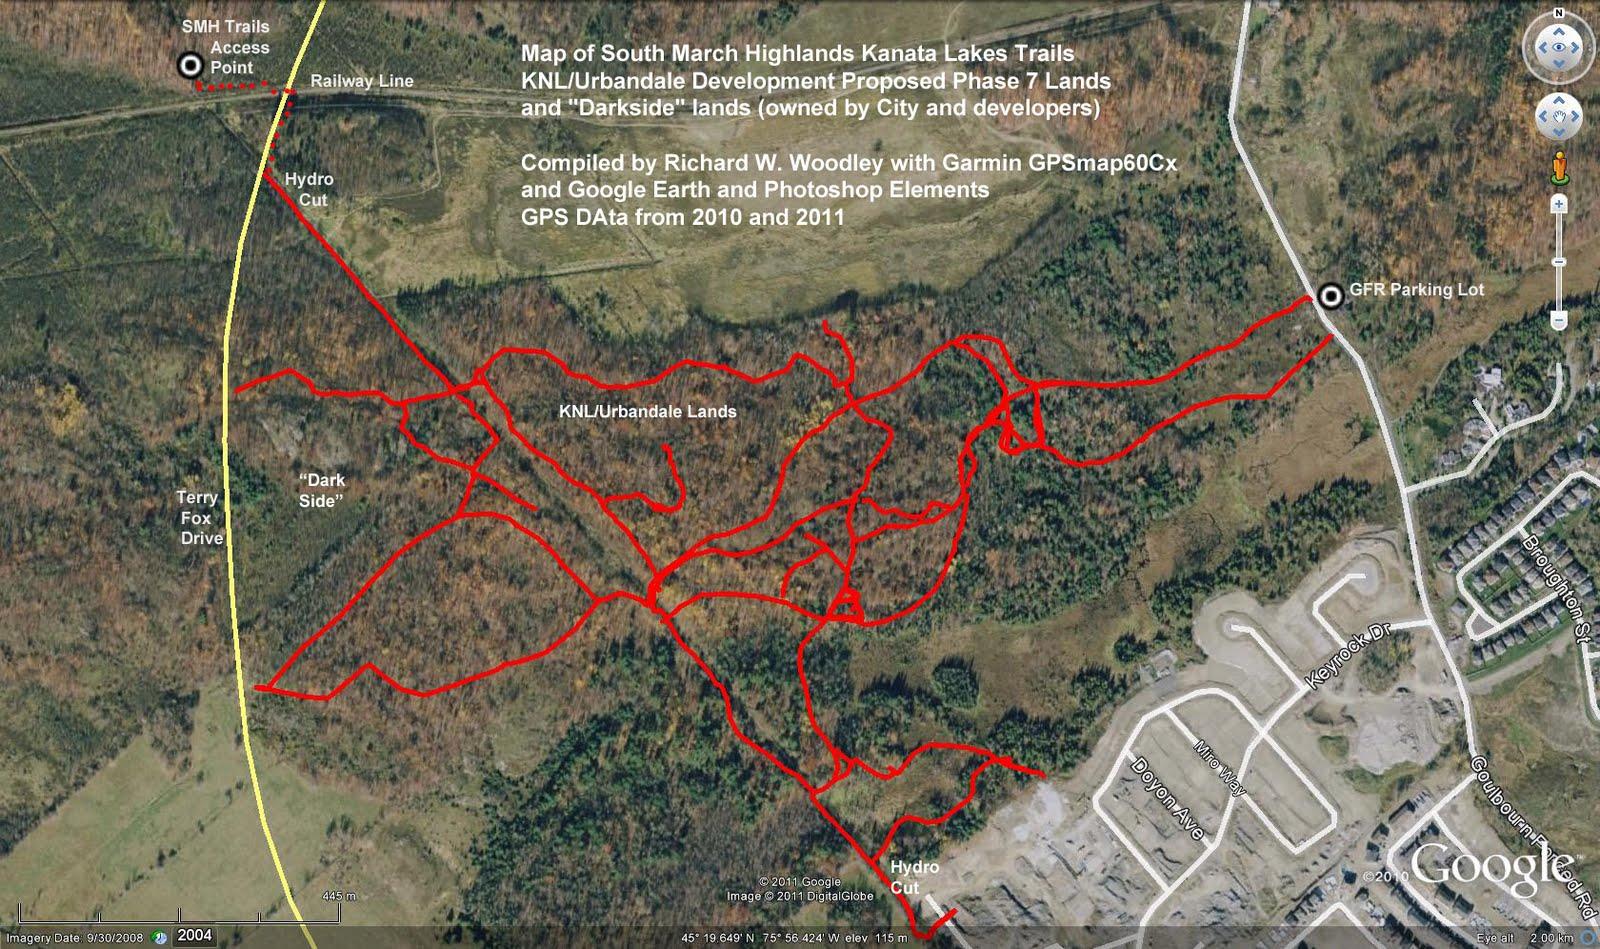 Richards GPS Trail Maps South March Highlands Kanata Lakes Trails